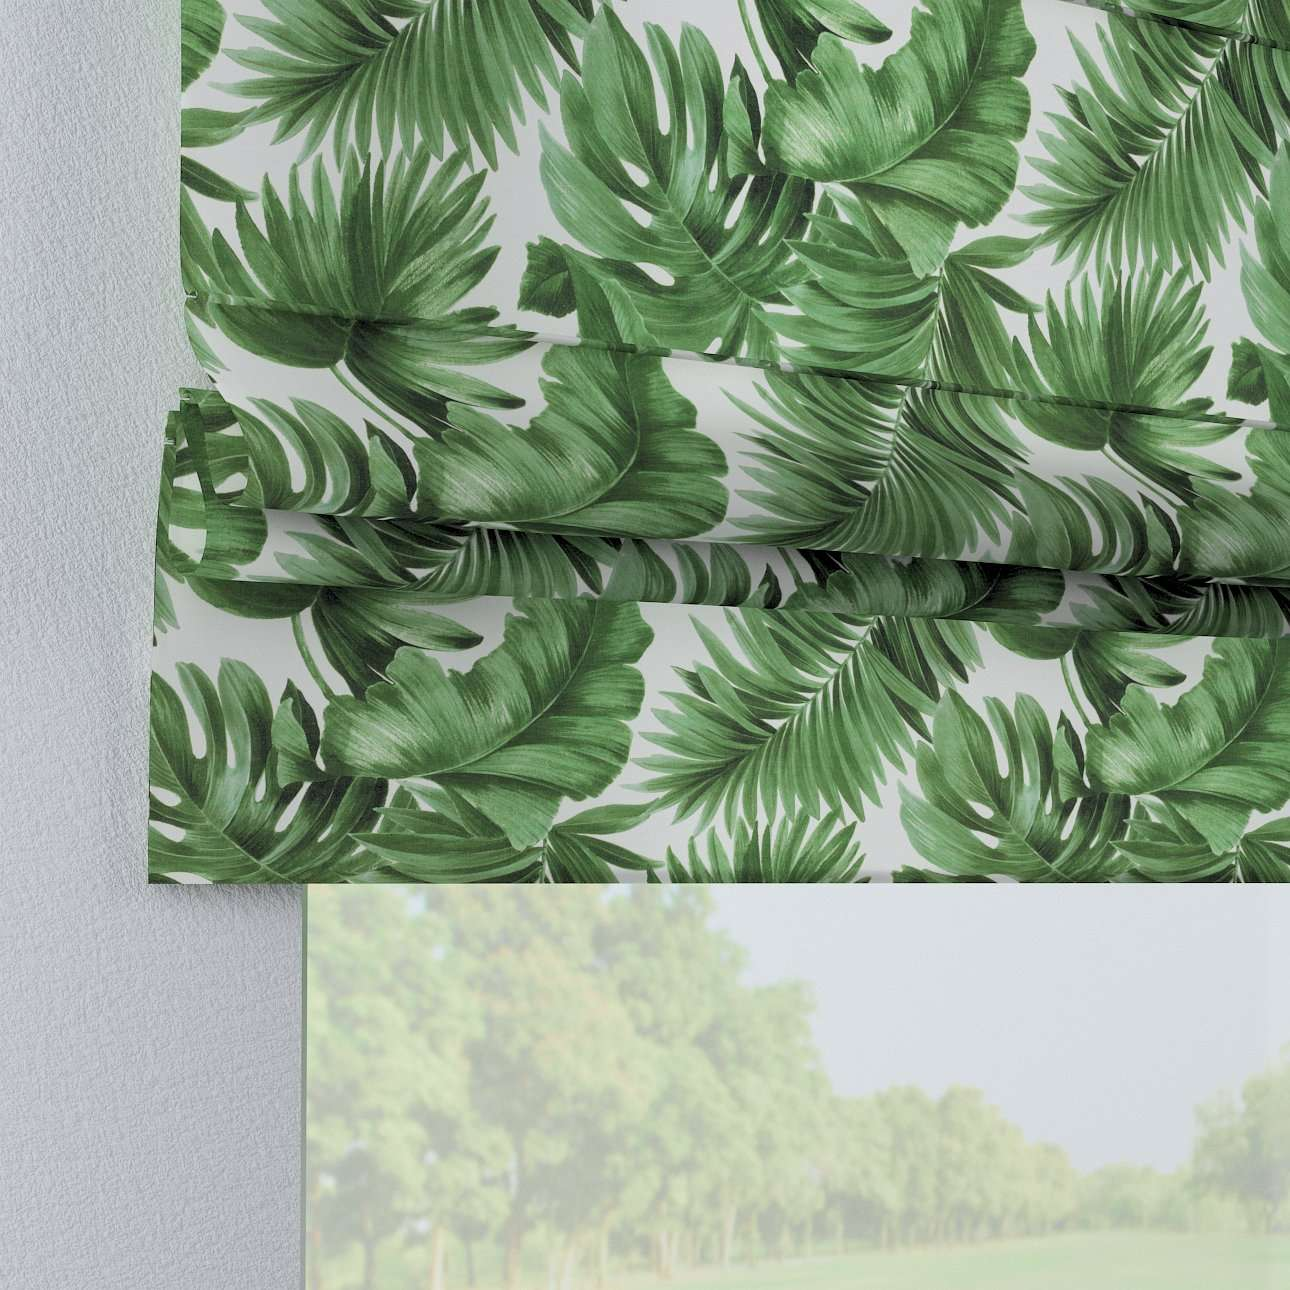 Padva roman blind  in collection Urban Jungle, fabric: 141-71